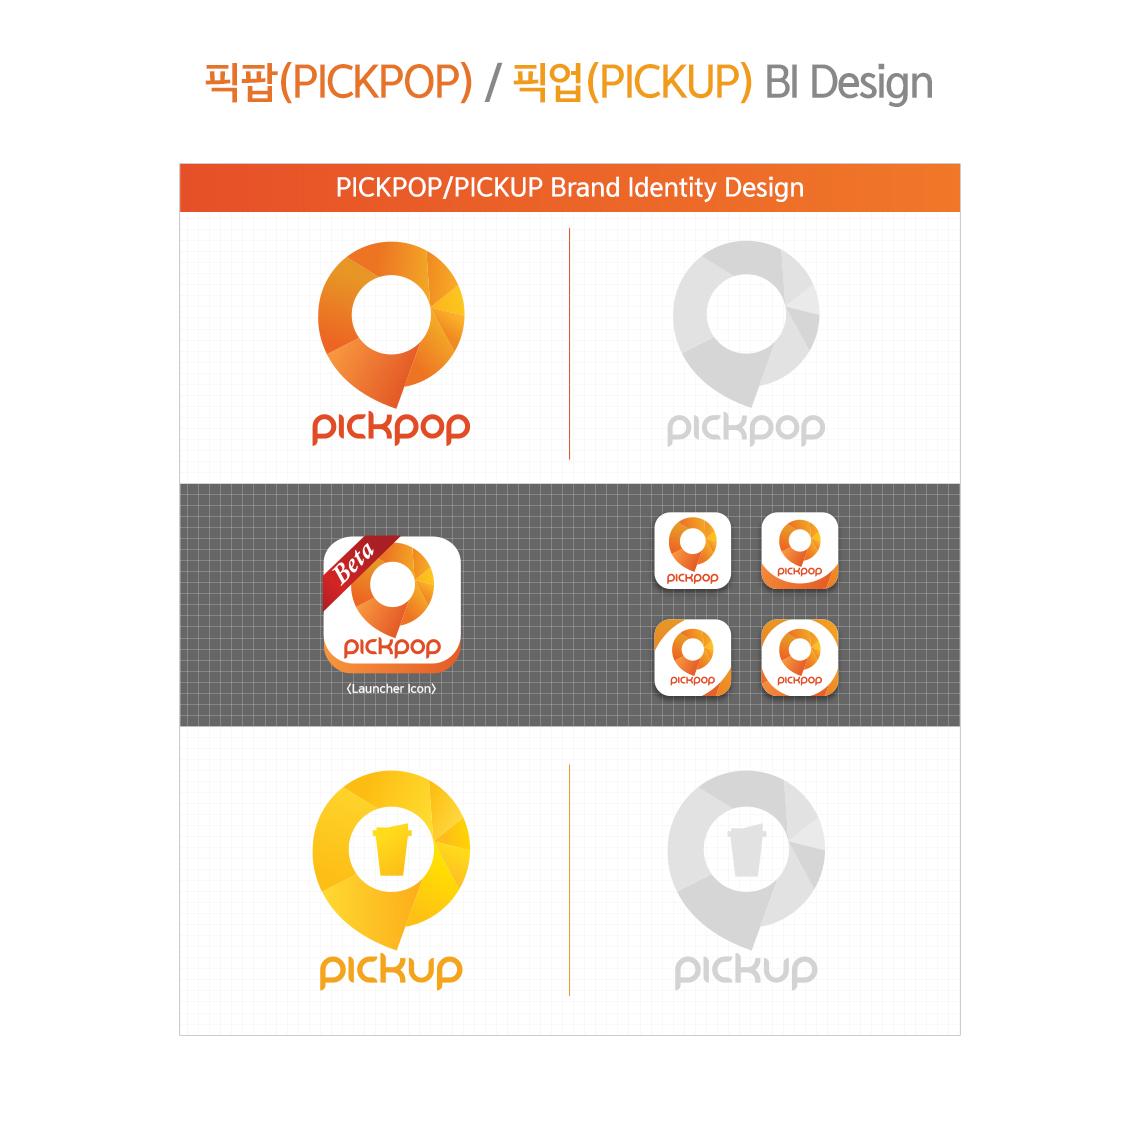 Load_픽팝04_BI,런처아이콘00